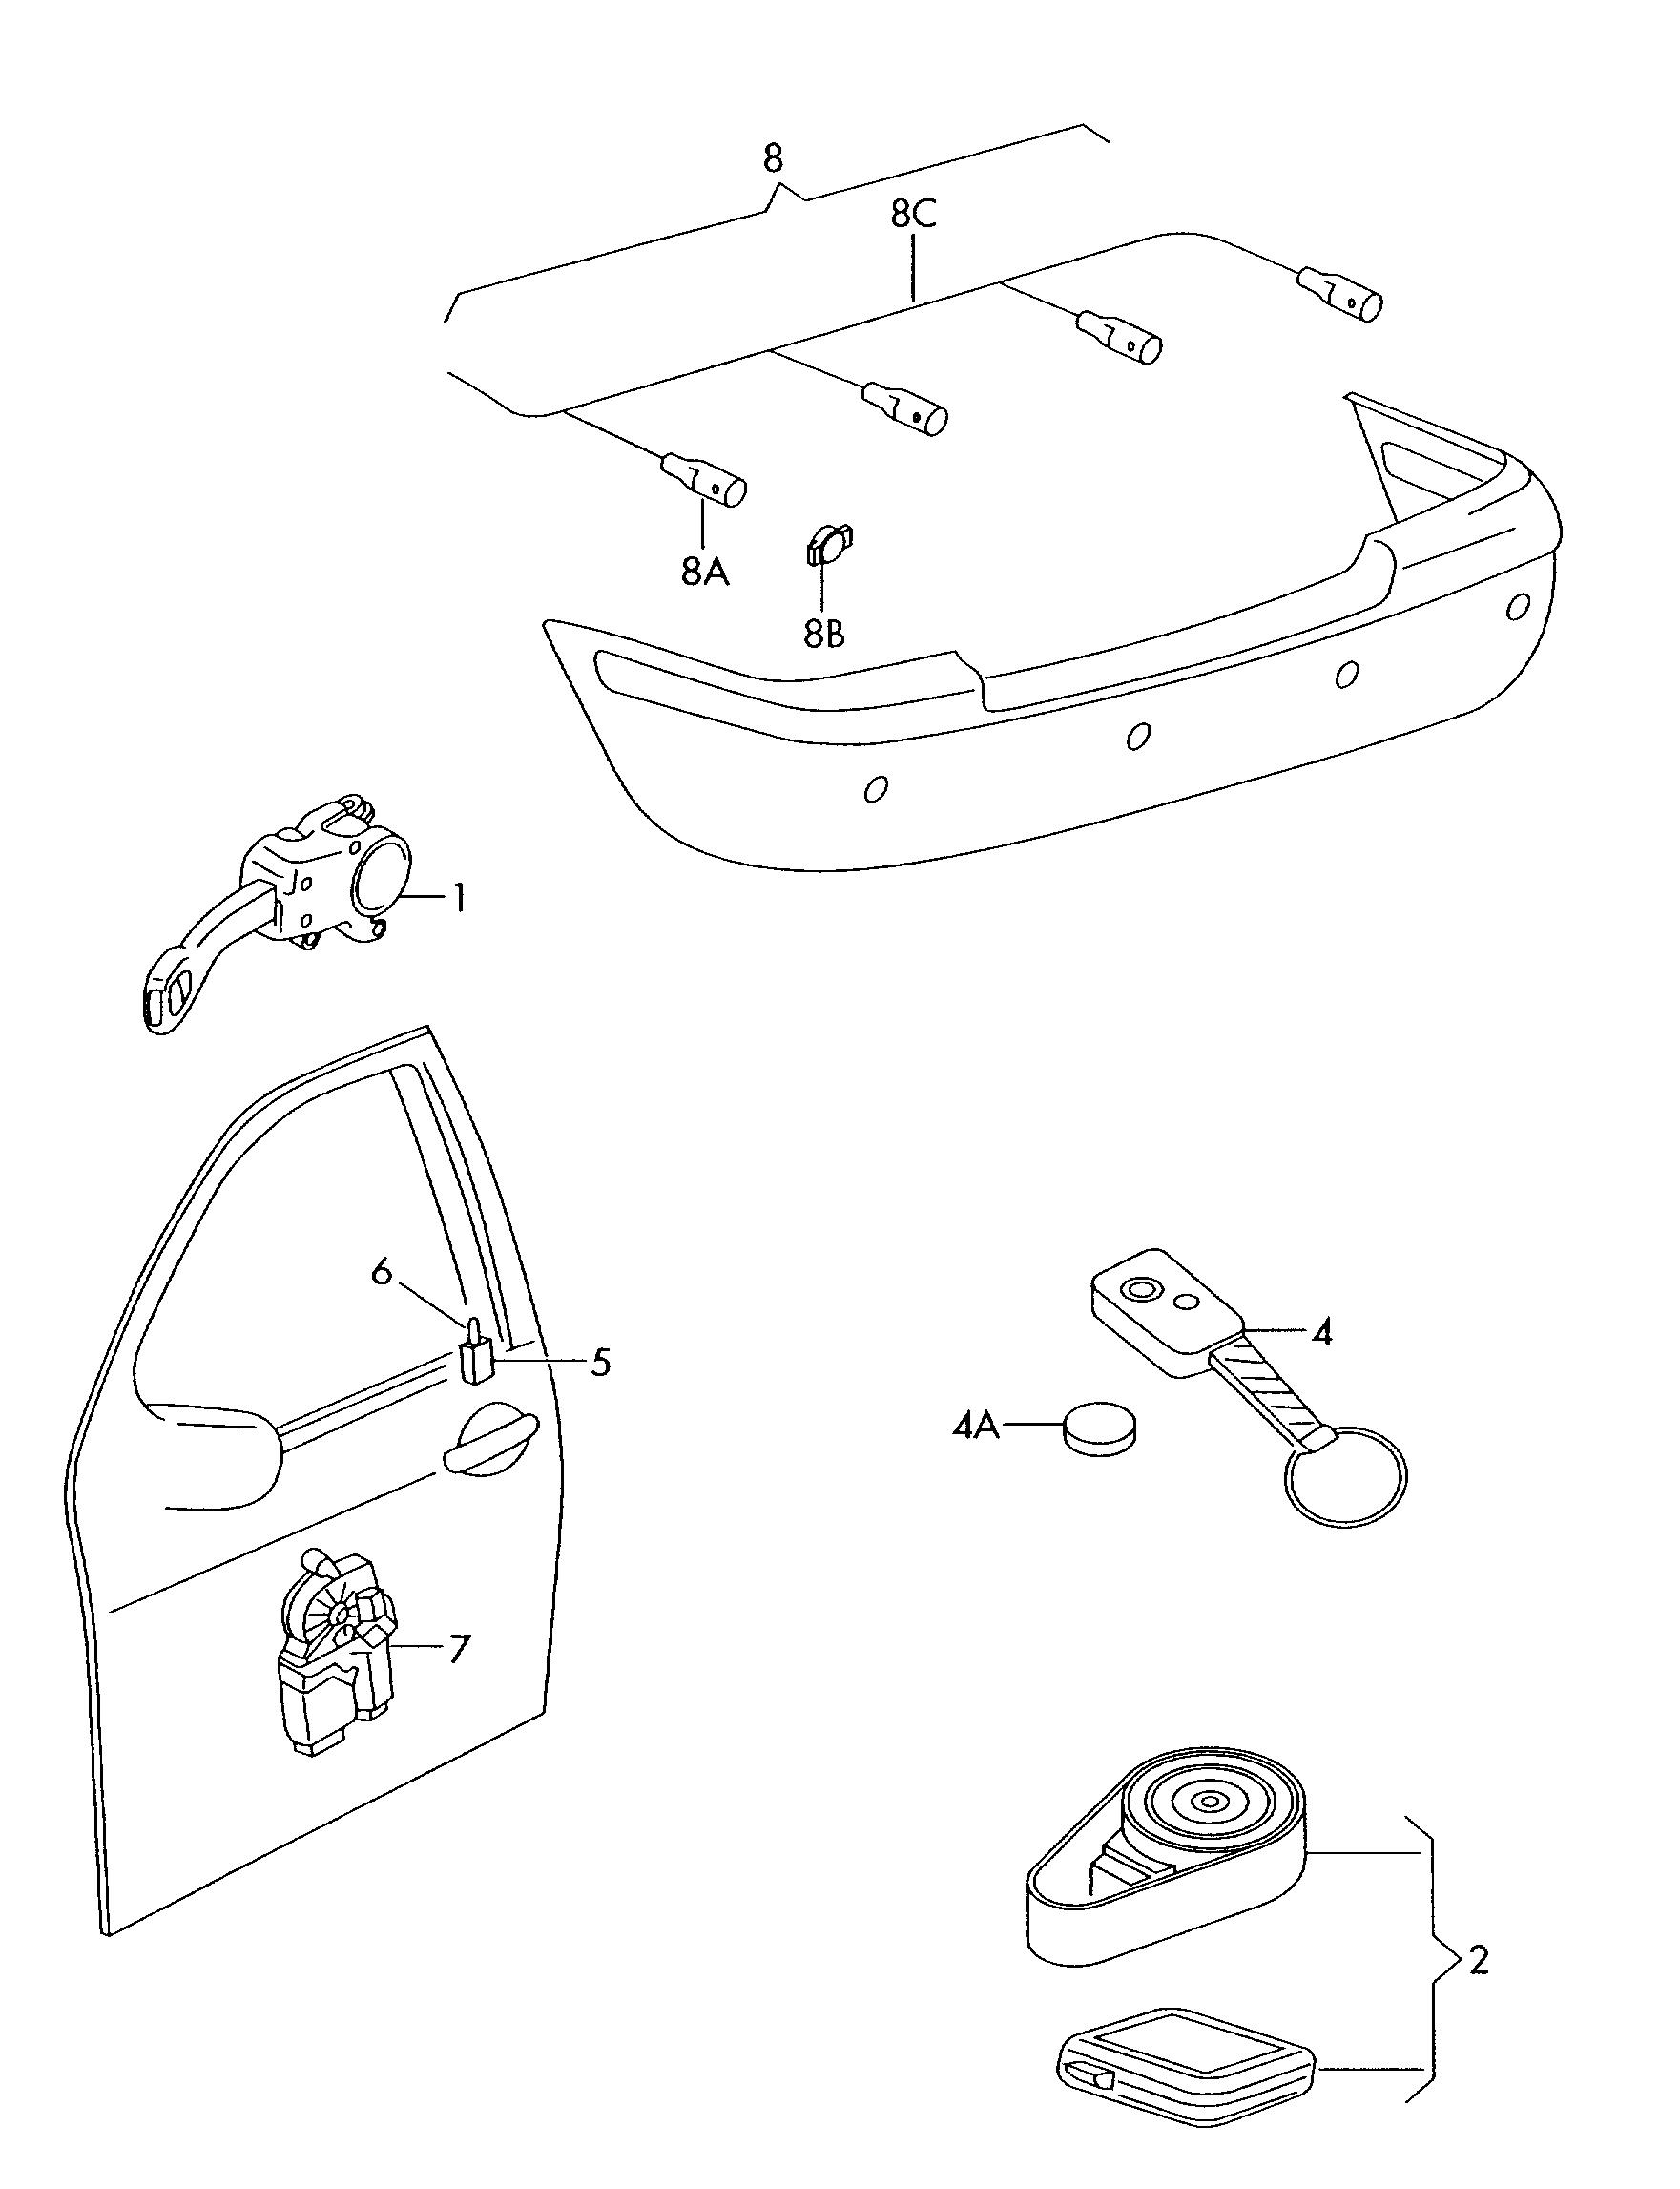 skoda fabia 2000 2004 for models with electrically operated Cruise Control Circuit Diagram skoda fabia 2000 2004 vag etka